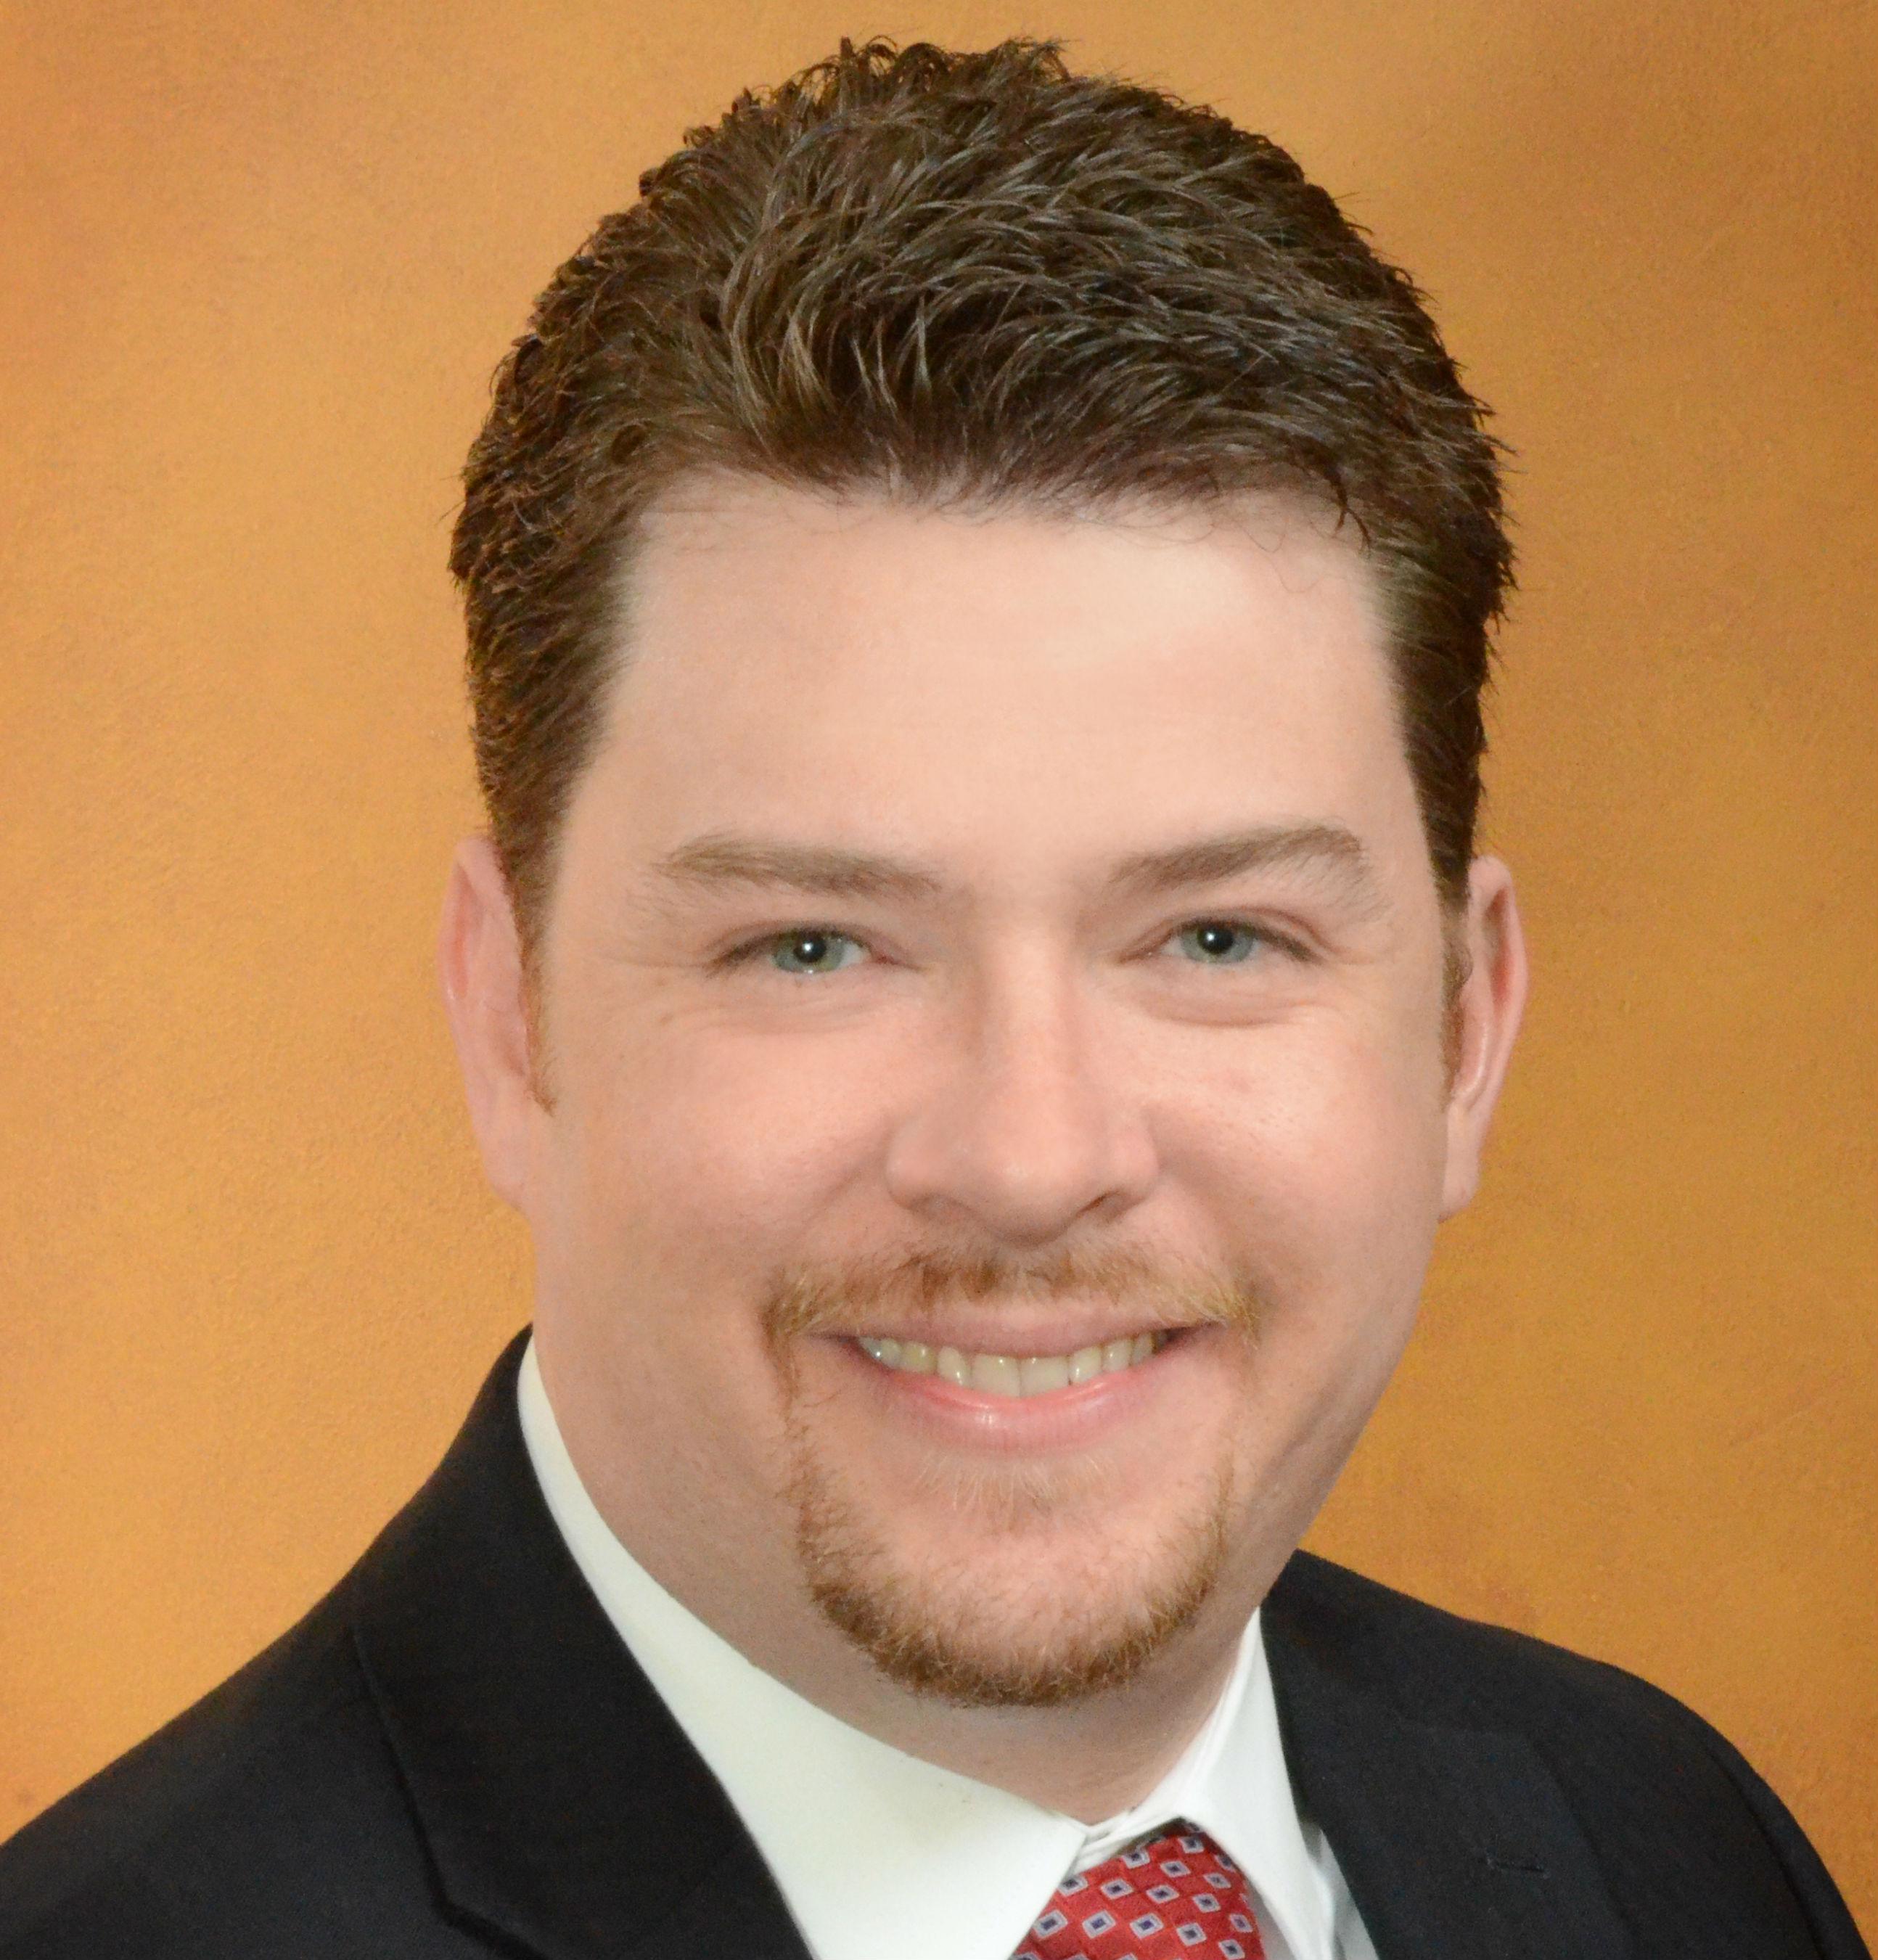 Chris Rondinelli, financial advisor Seven Fields PA